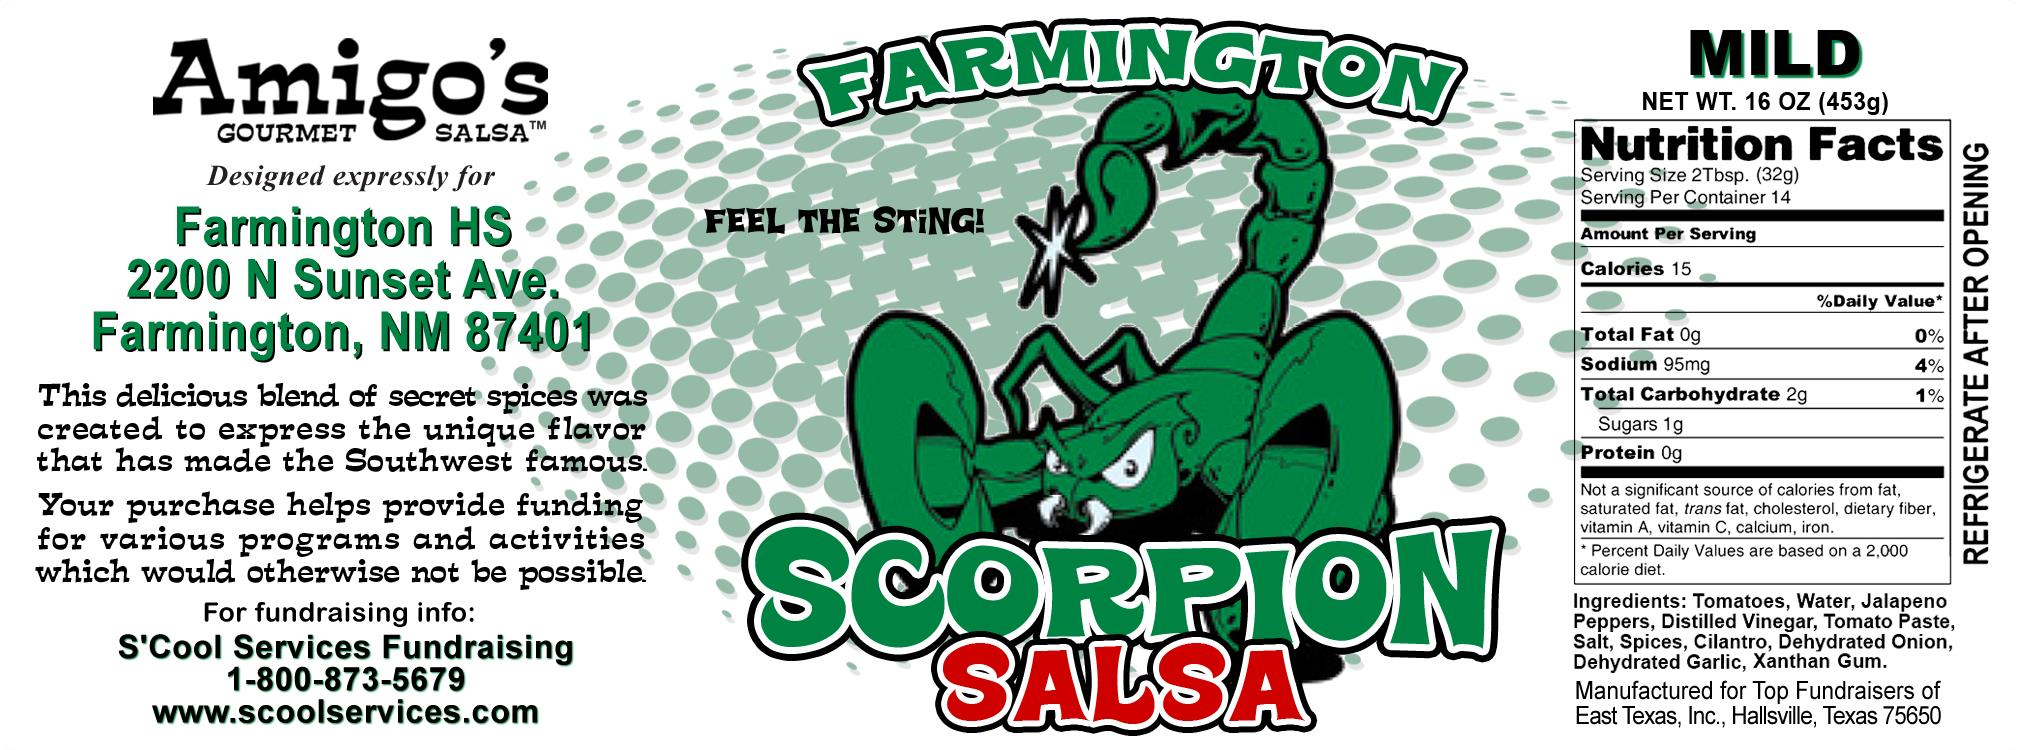 Farmington Scorpions Jar Label MILD.jpg